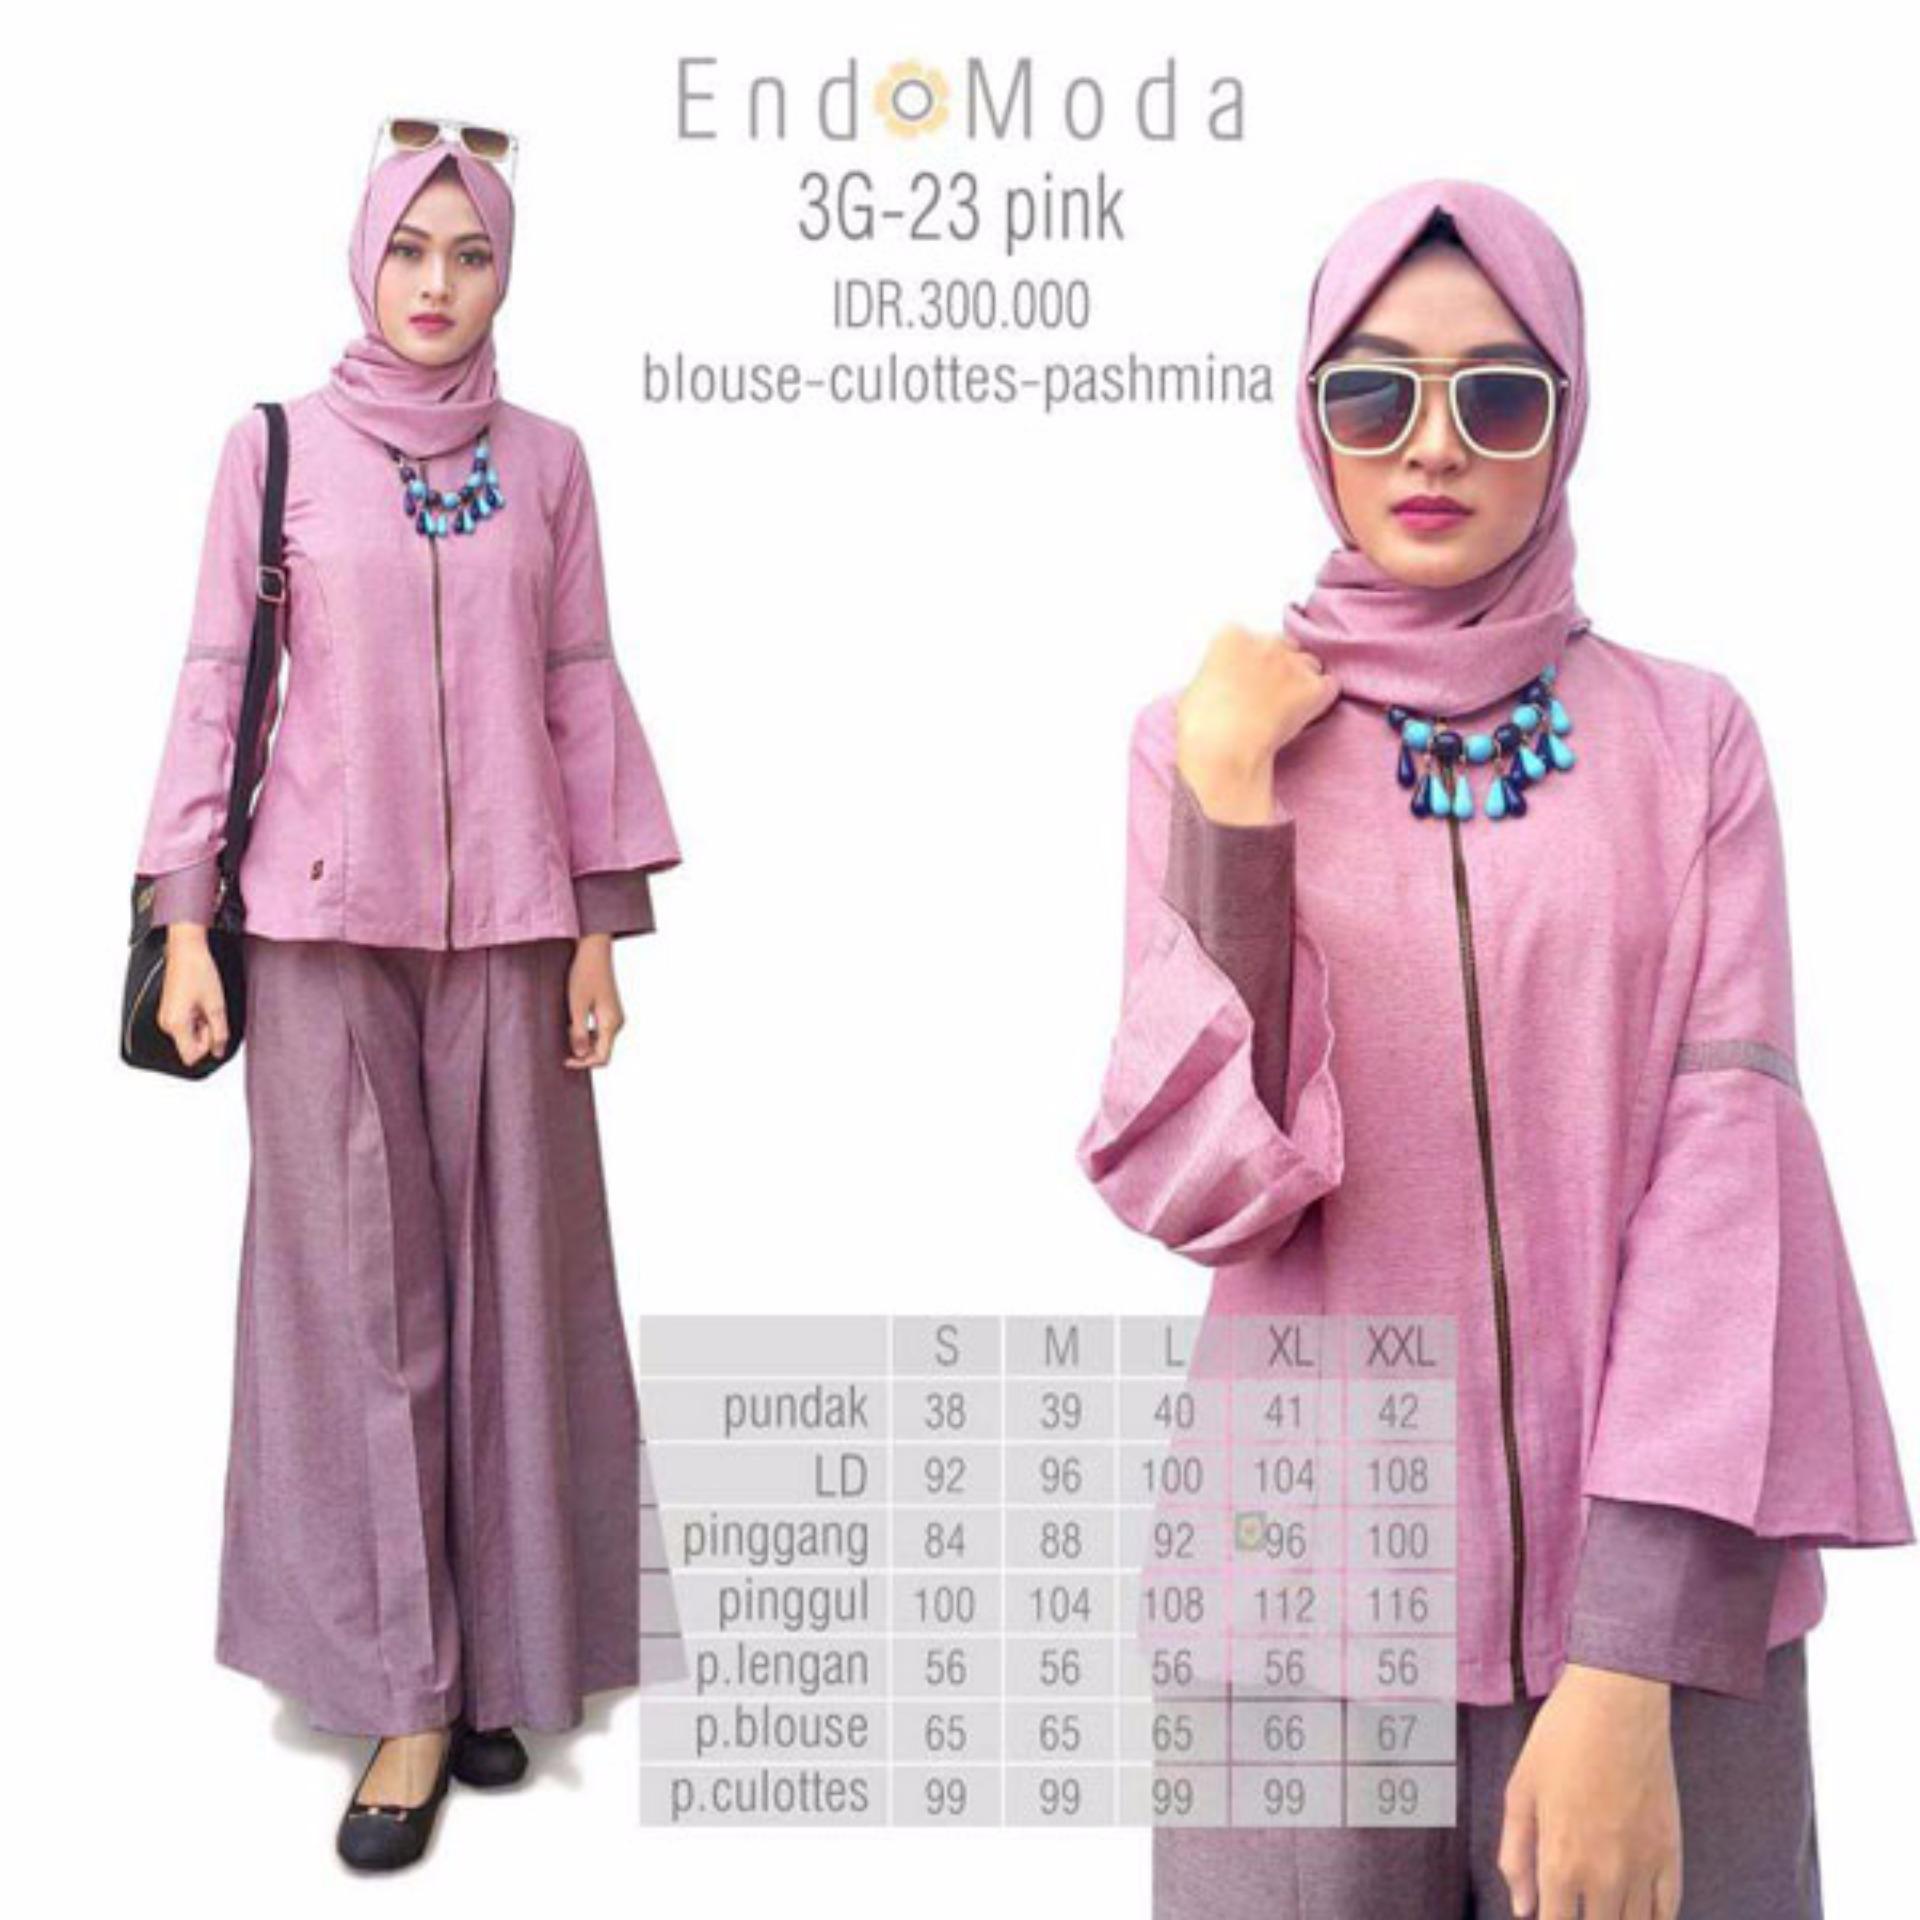 Harga Baju Original Endo Moda 3G 23 Setelanwanita Baju Muslim Modern Gamis Katun Supernova Premium Warnapink Paling Murah